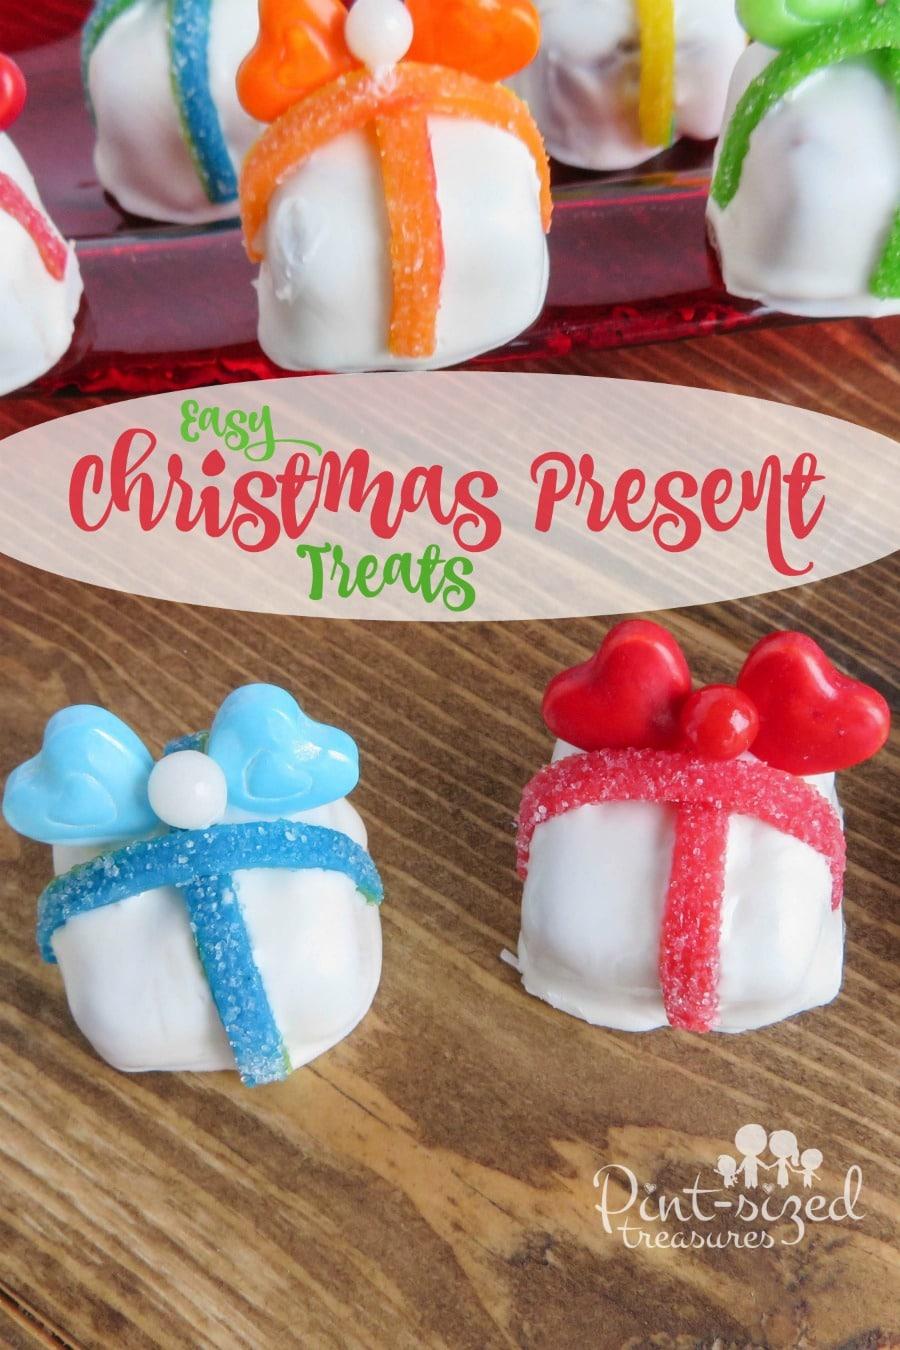 easy Christmas present treats